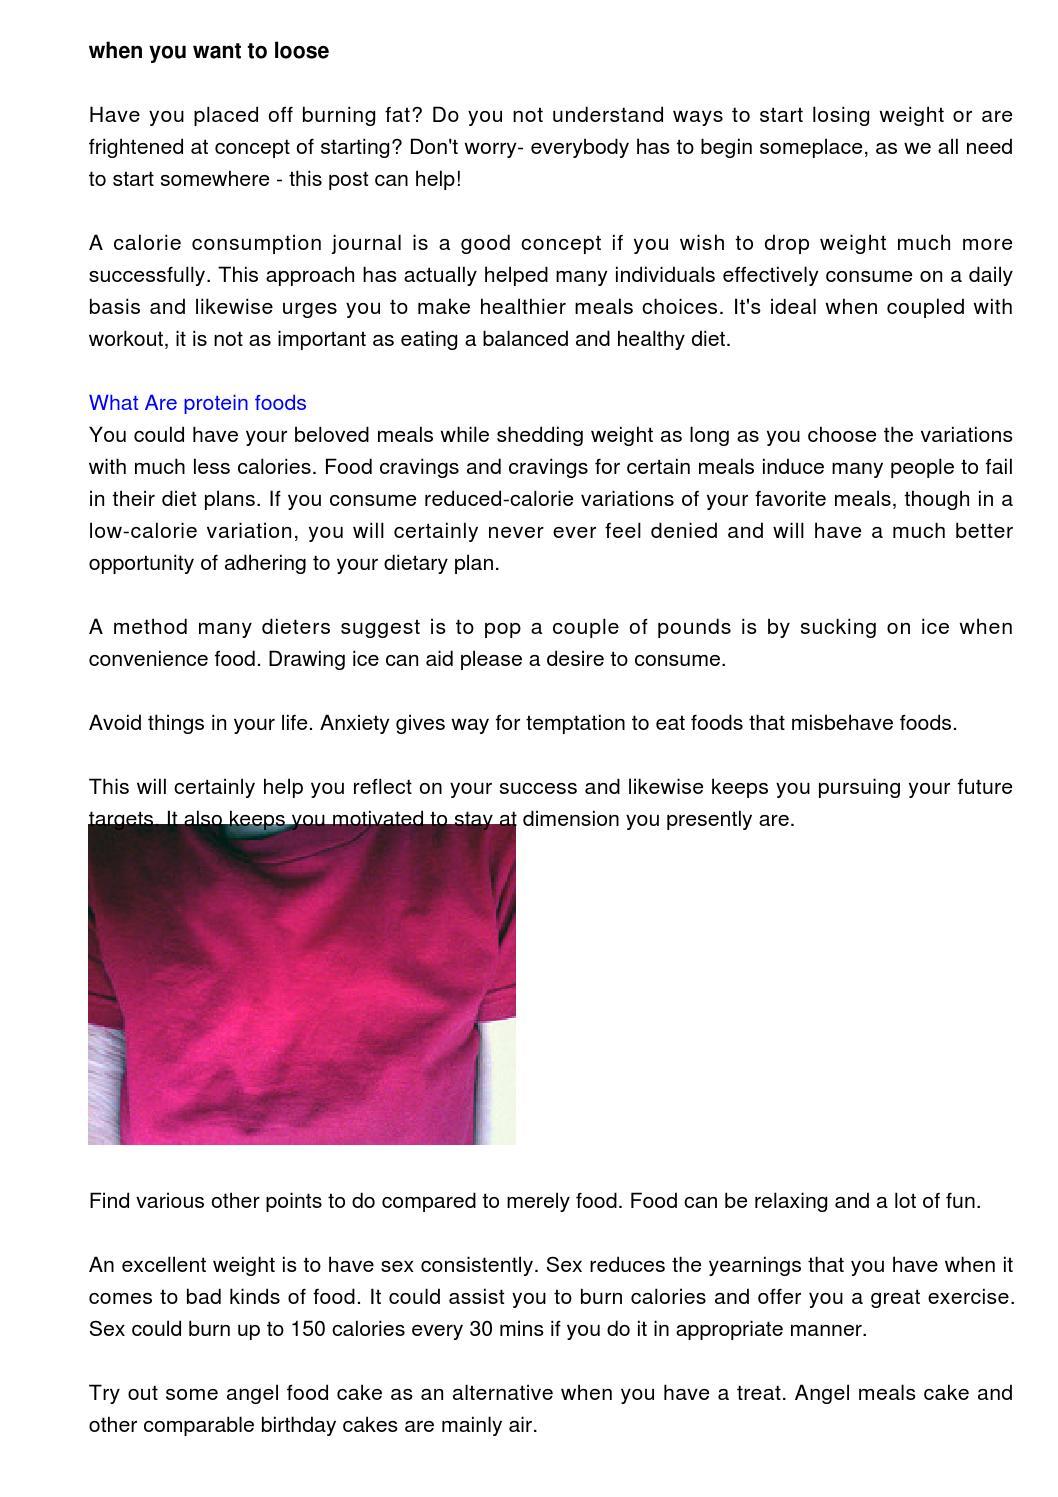 Menopause help with vaginal atrophy